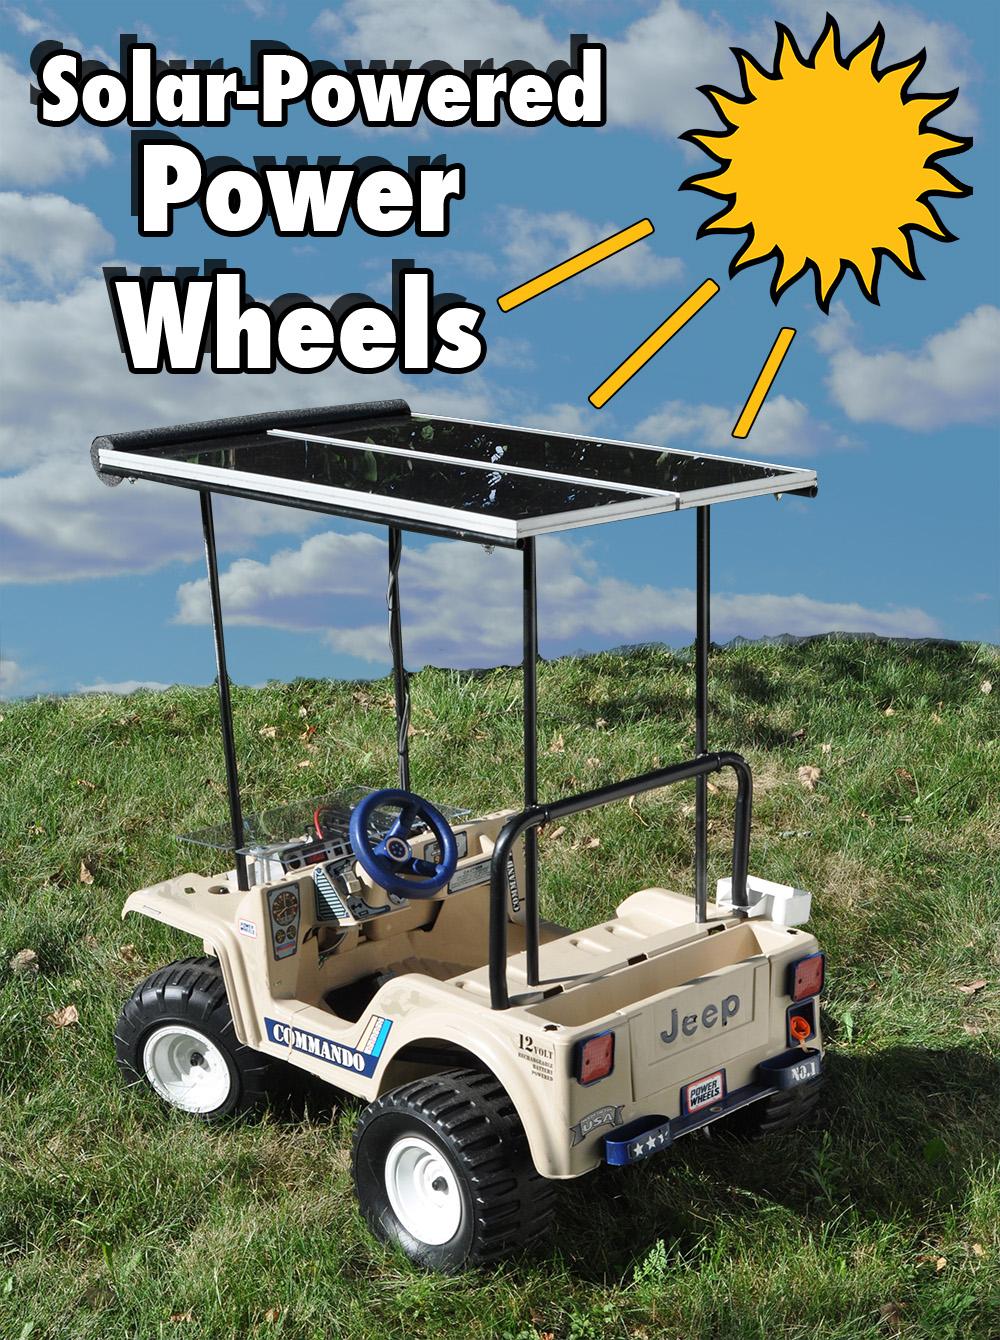 Solar-Powered POWER WHEELS